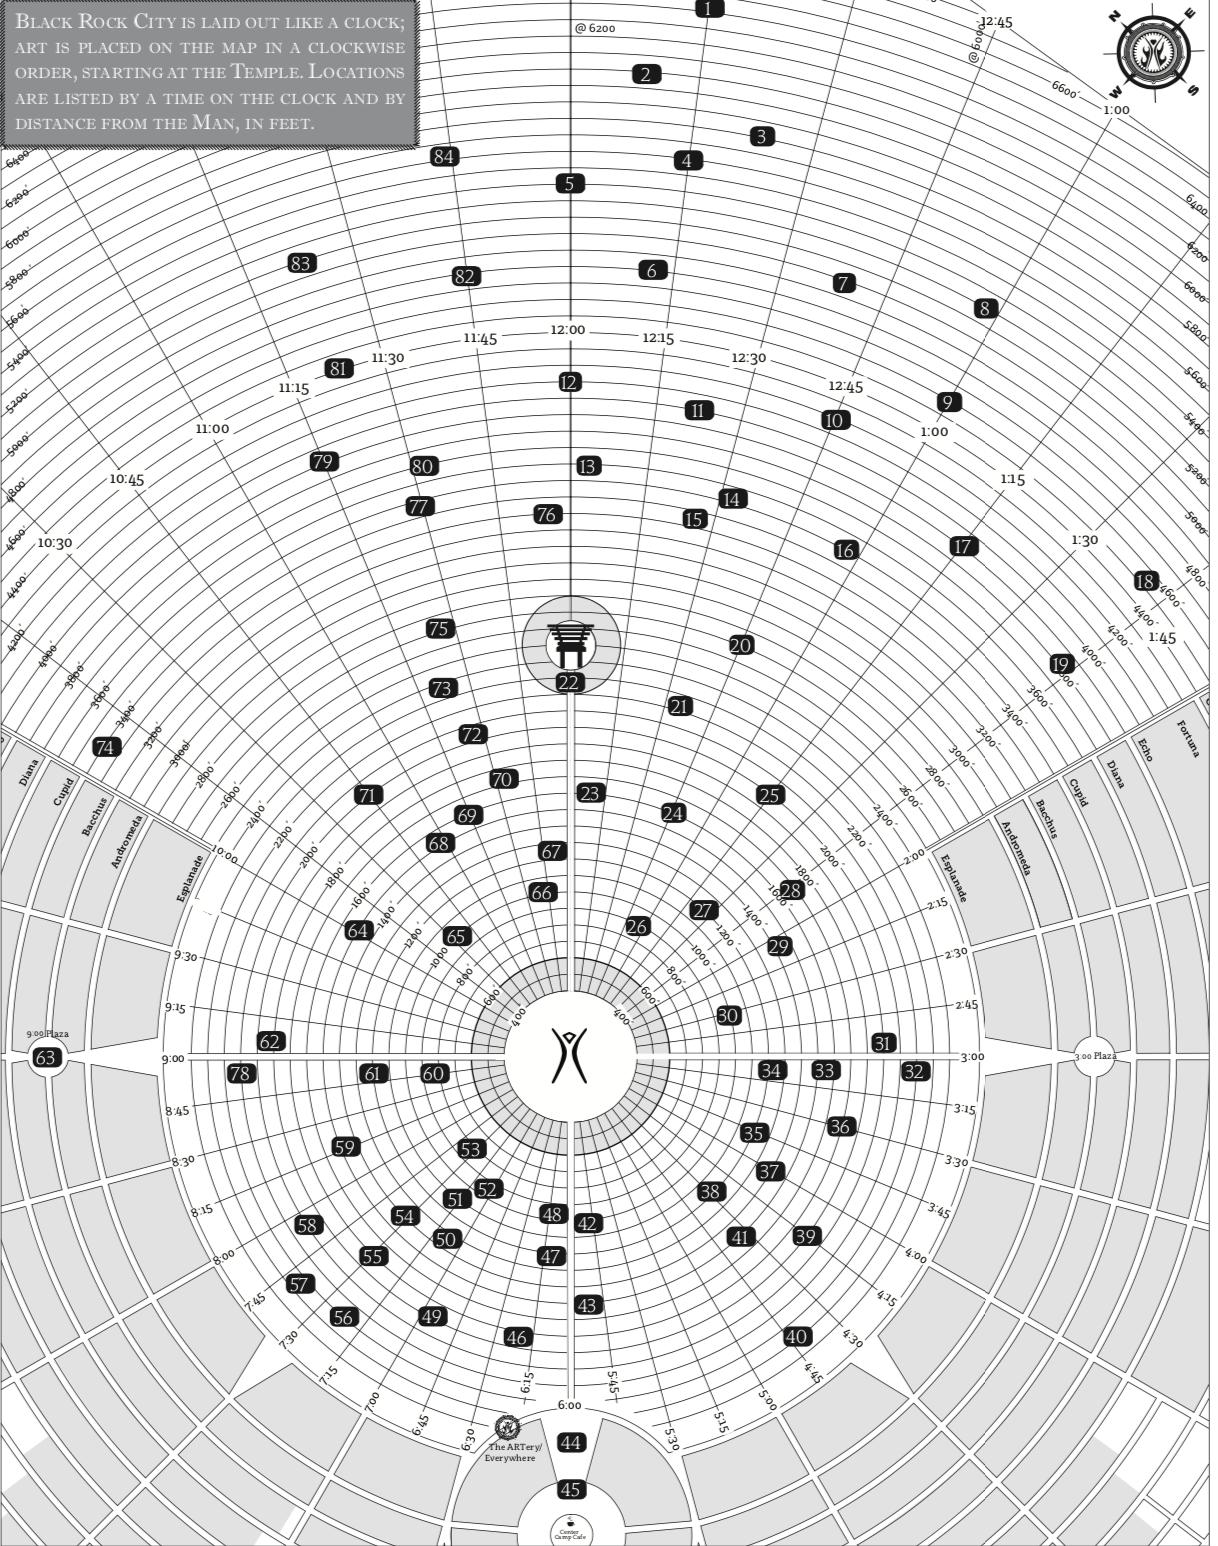 2019 Burning Man Art Map -